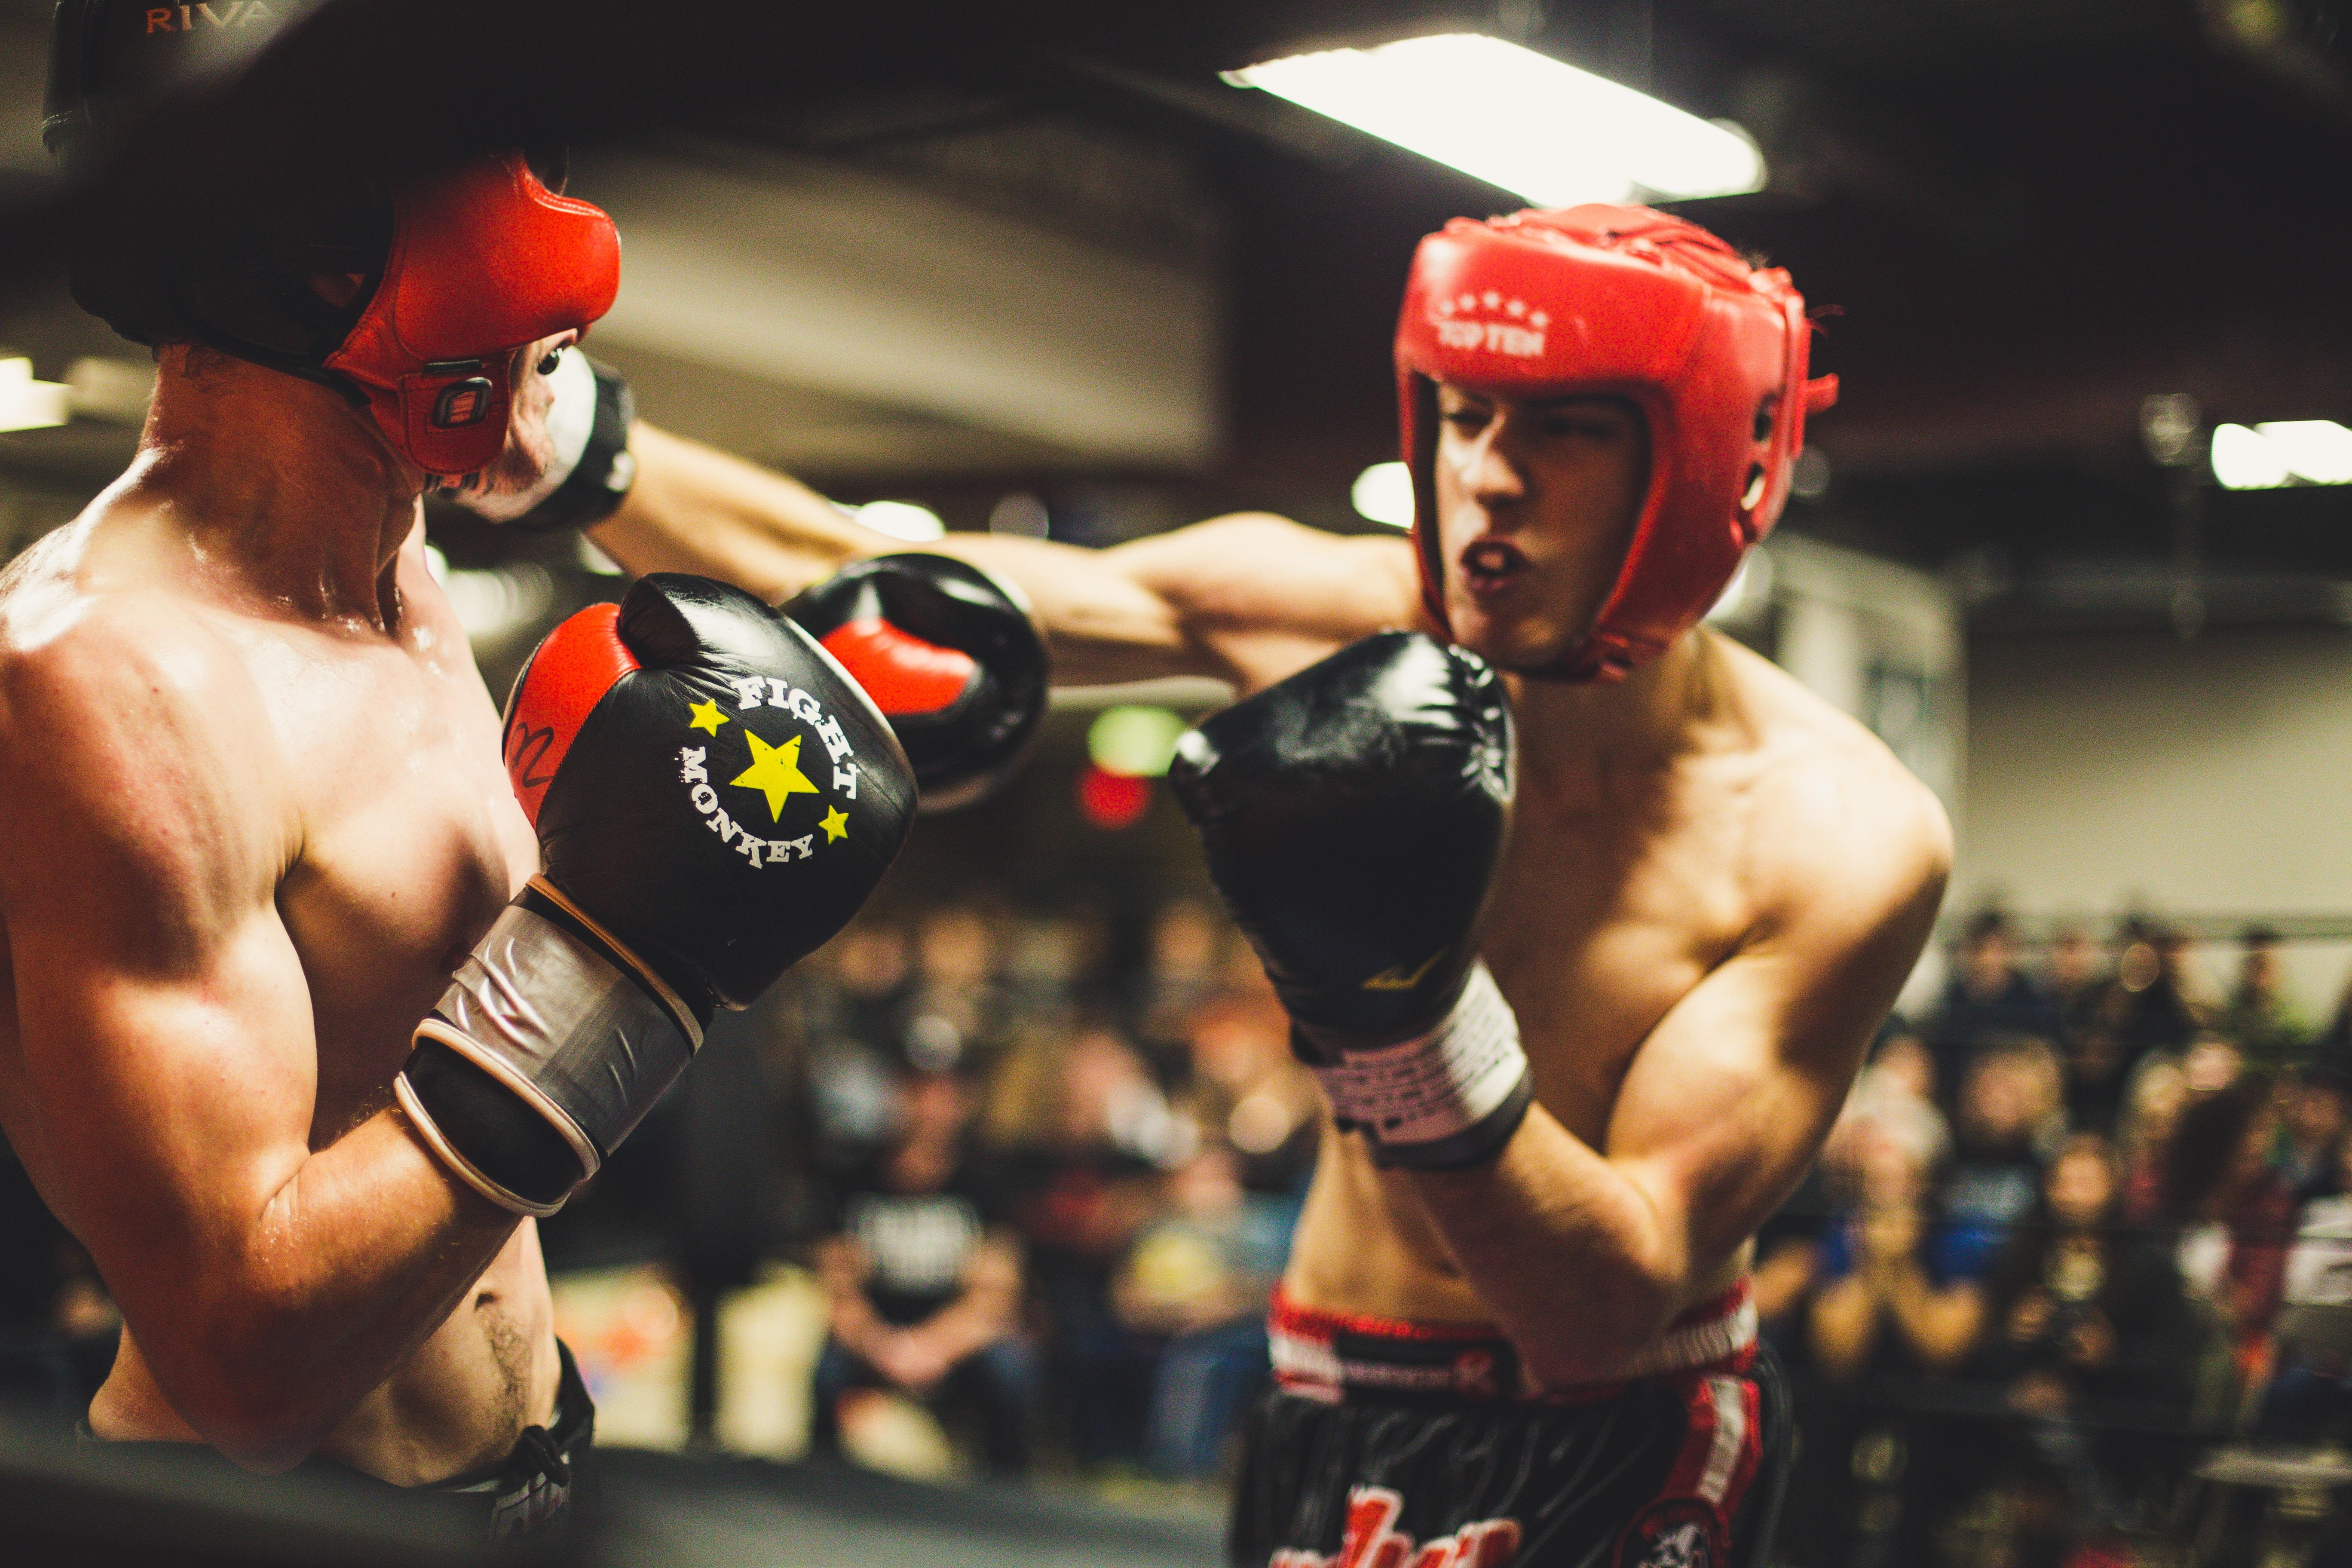 Boxing pics images 22